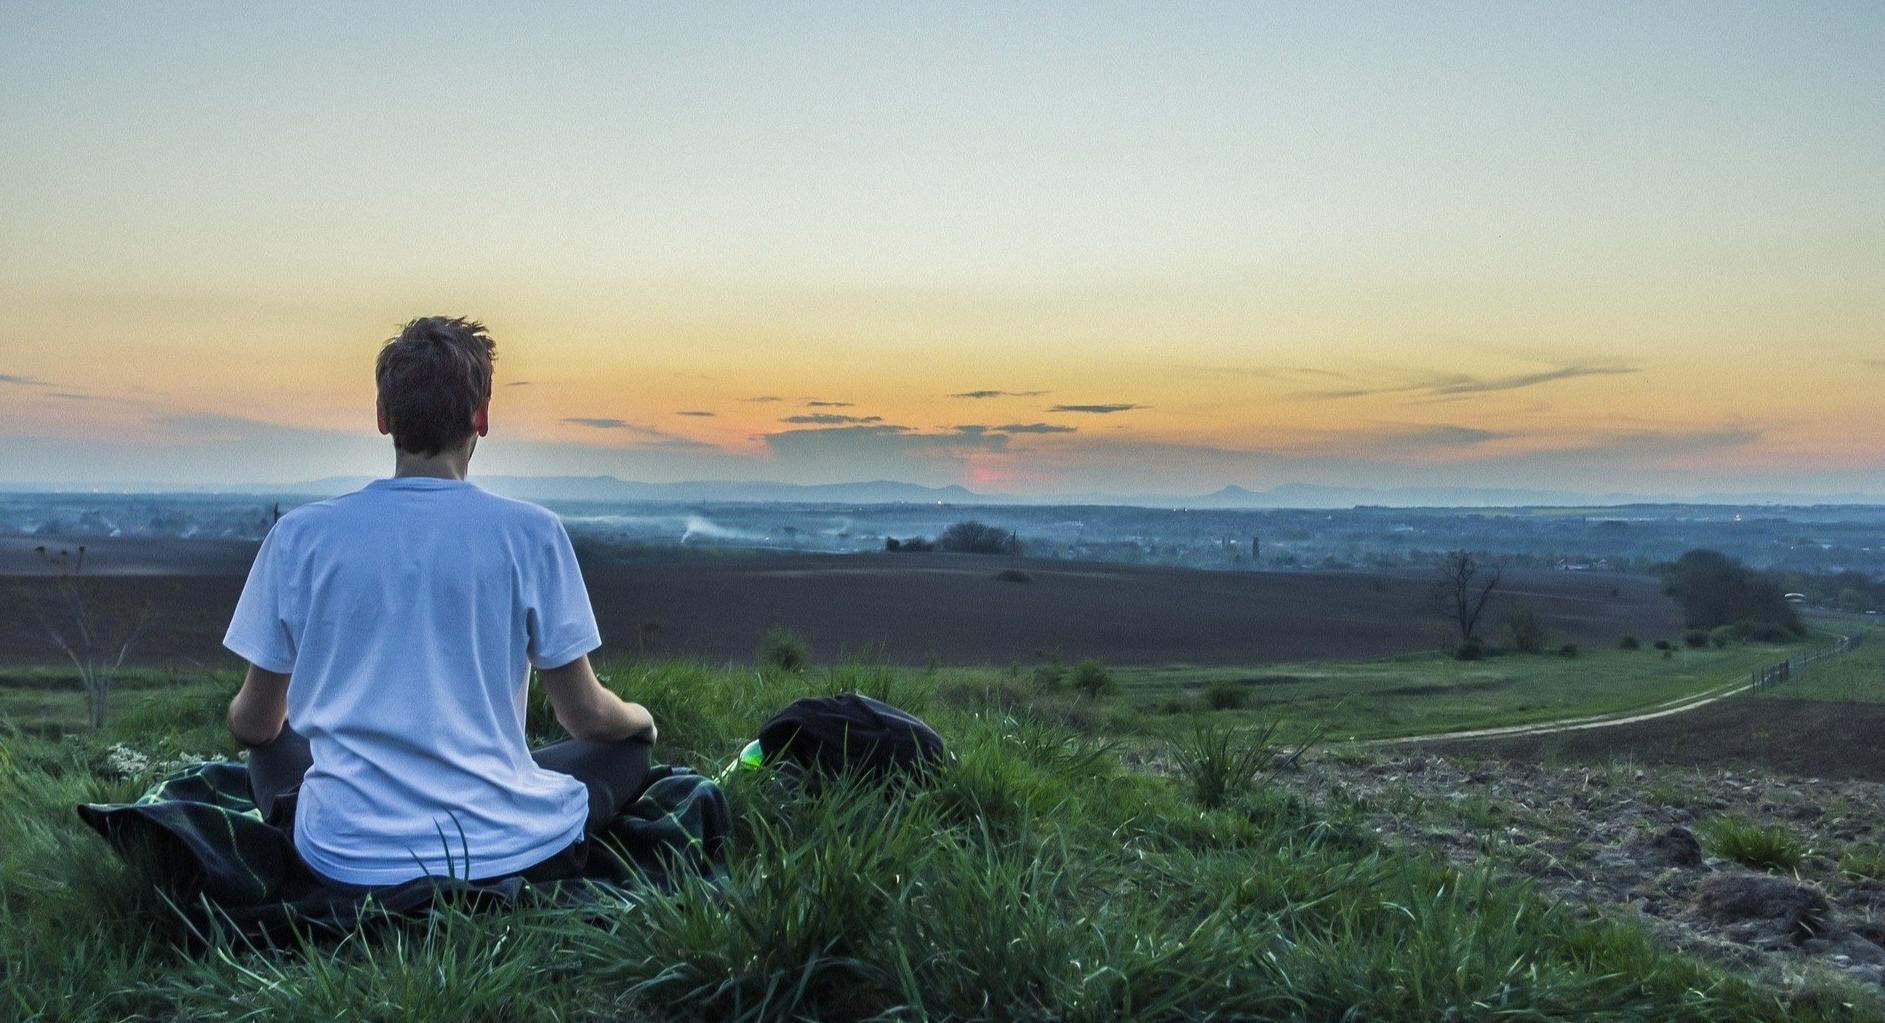 man meditating outdoors on hill